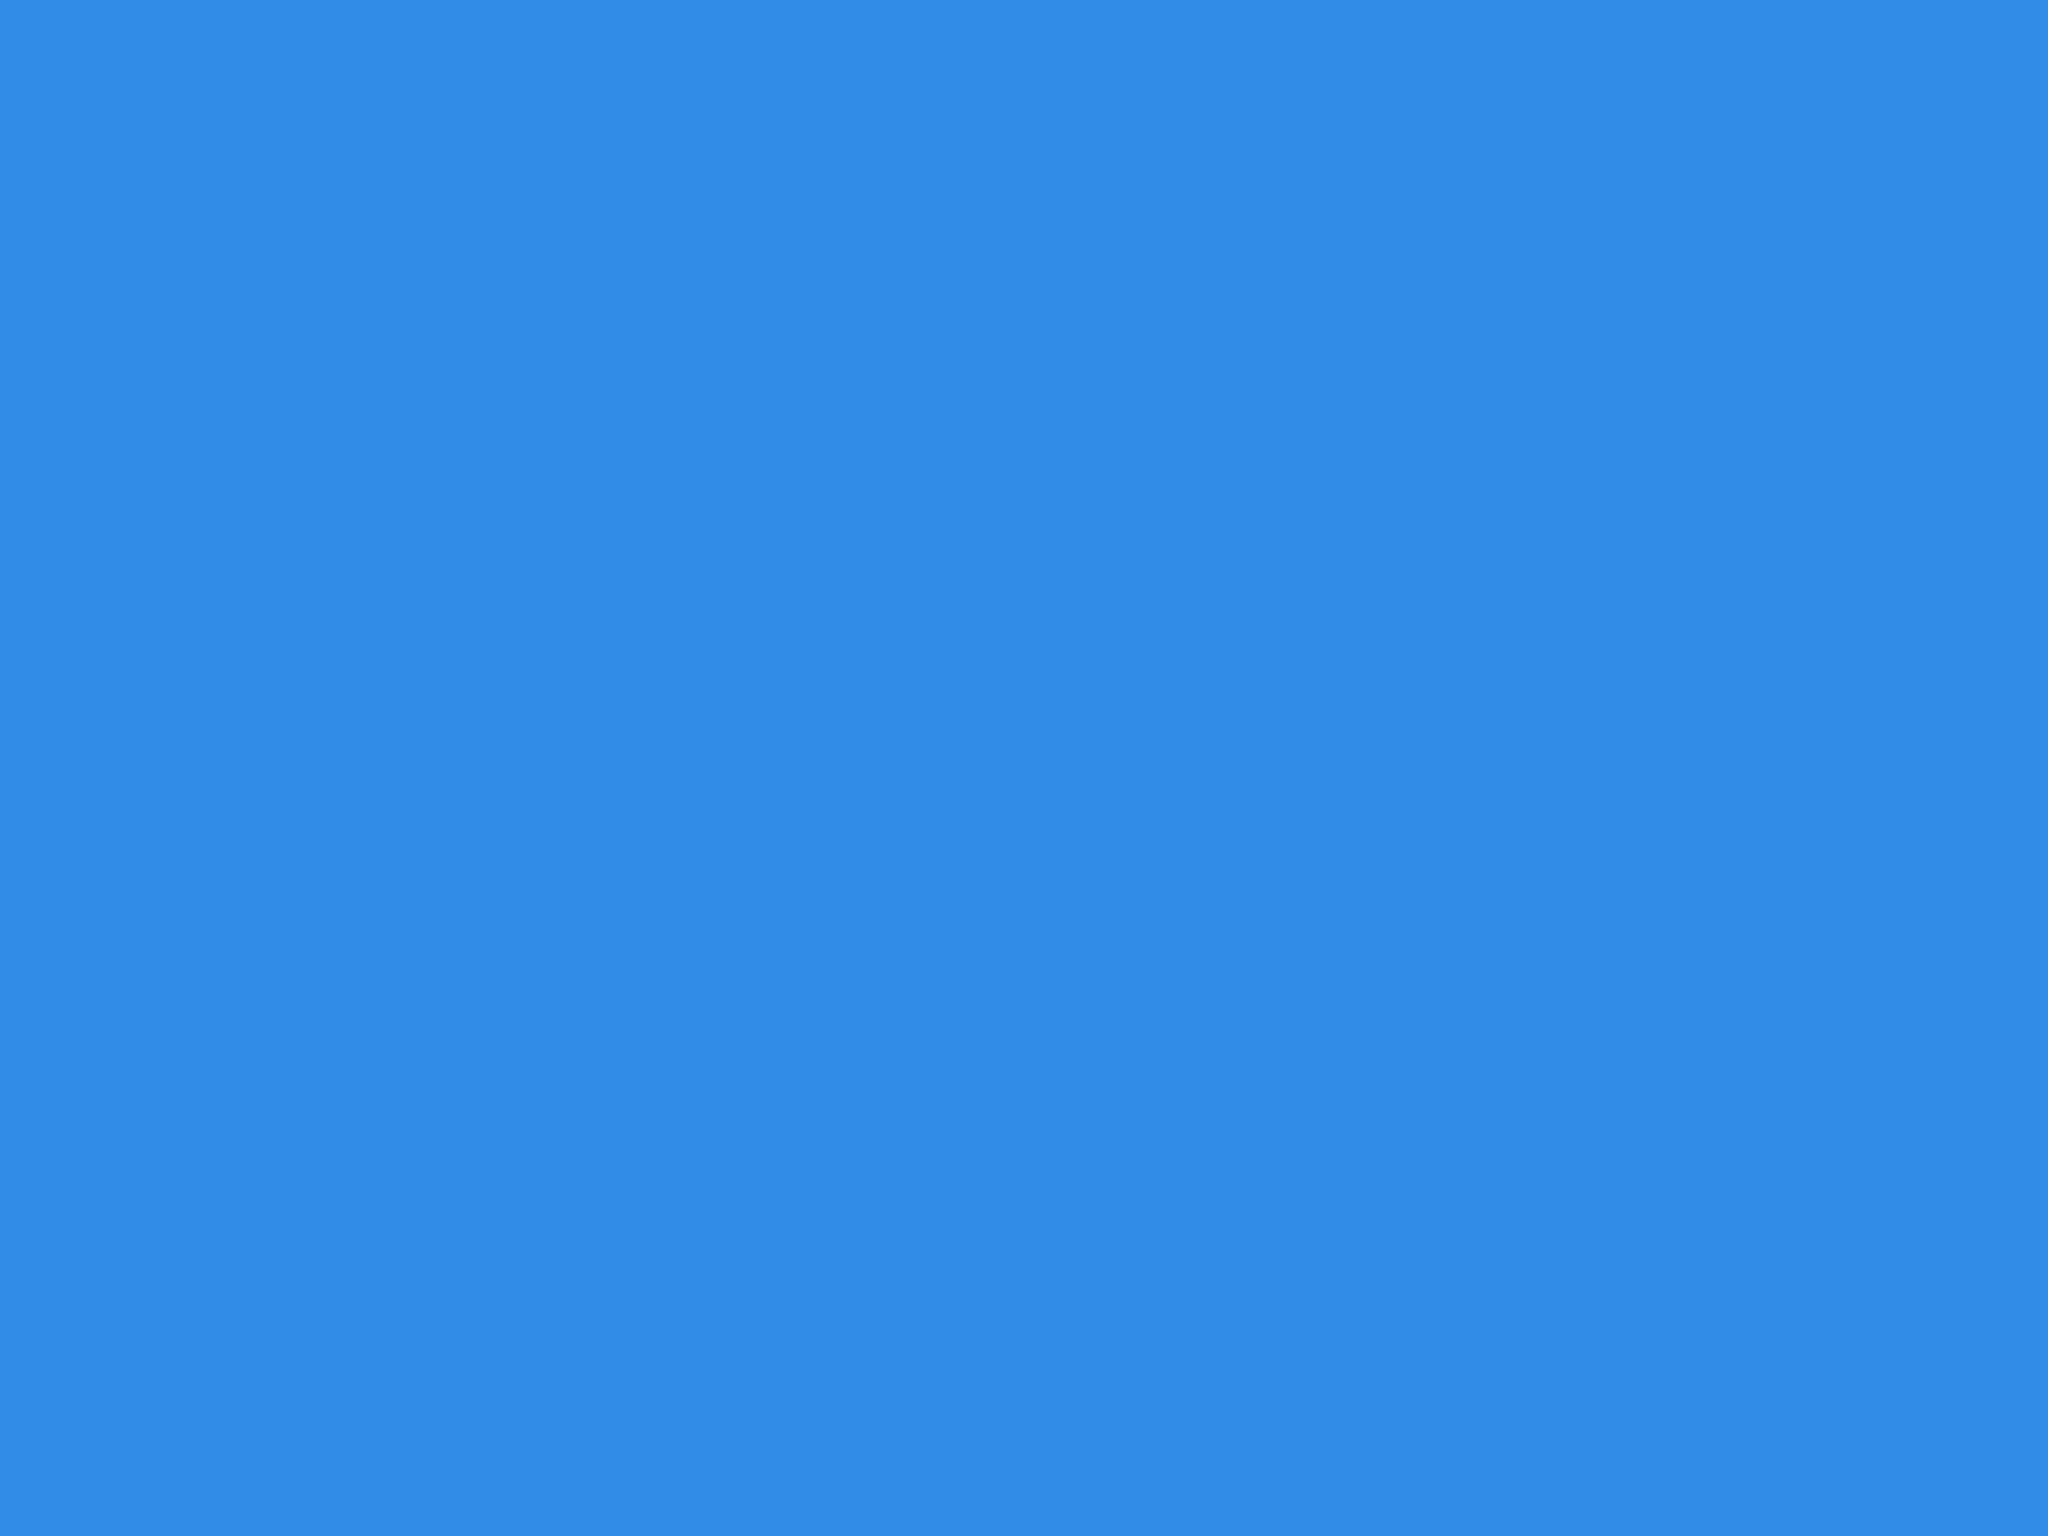 2048x1536 Bleu De France Solid Color Background